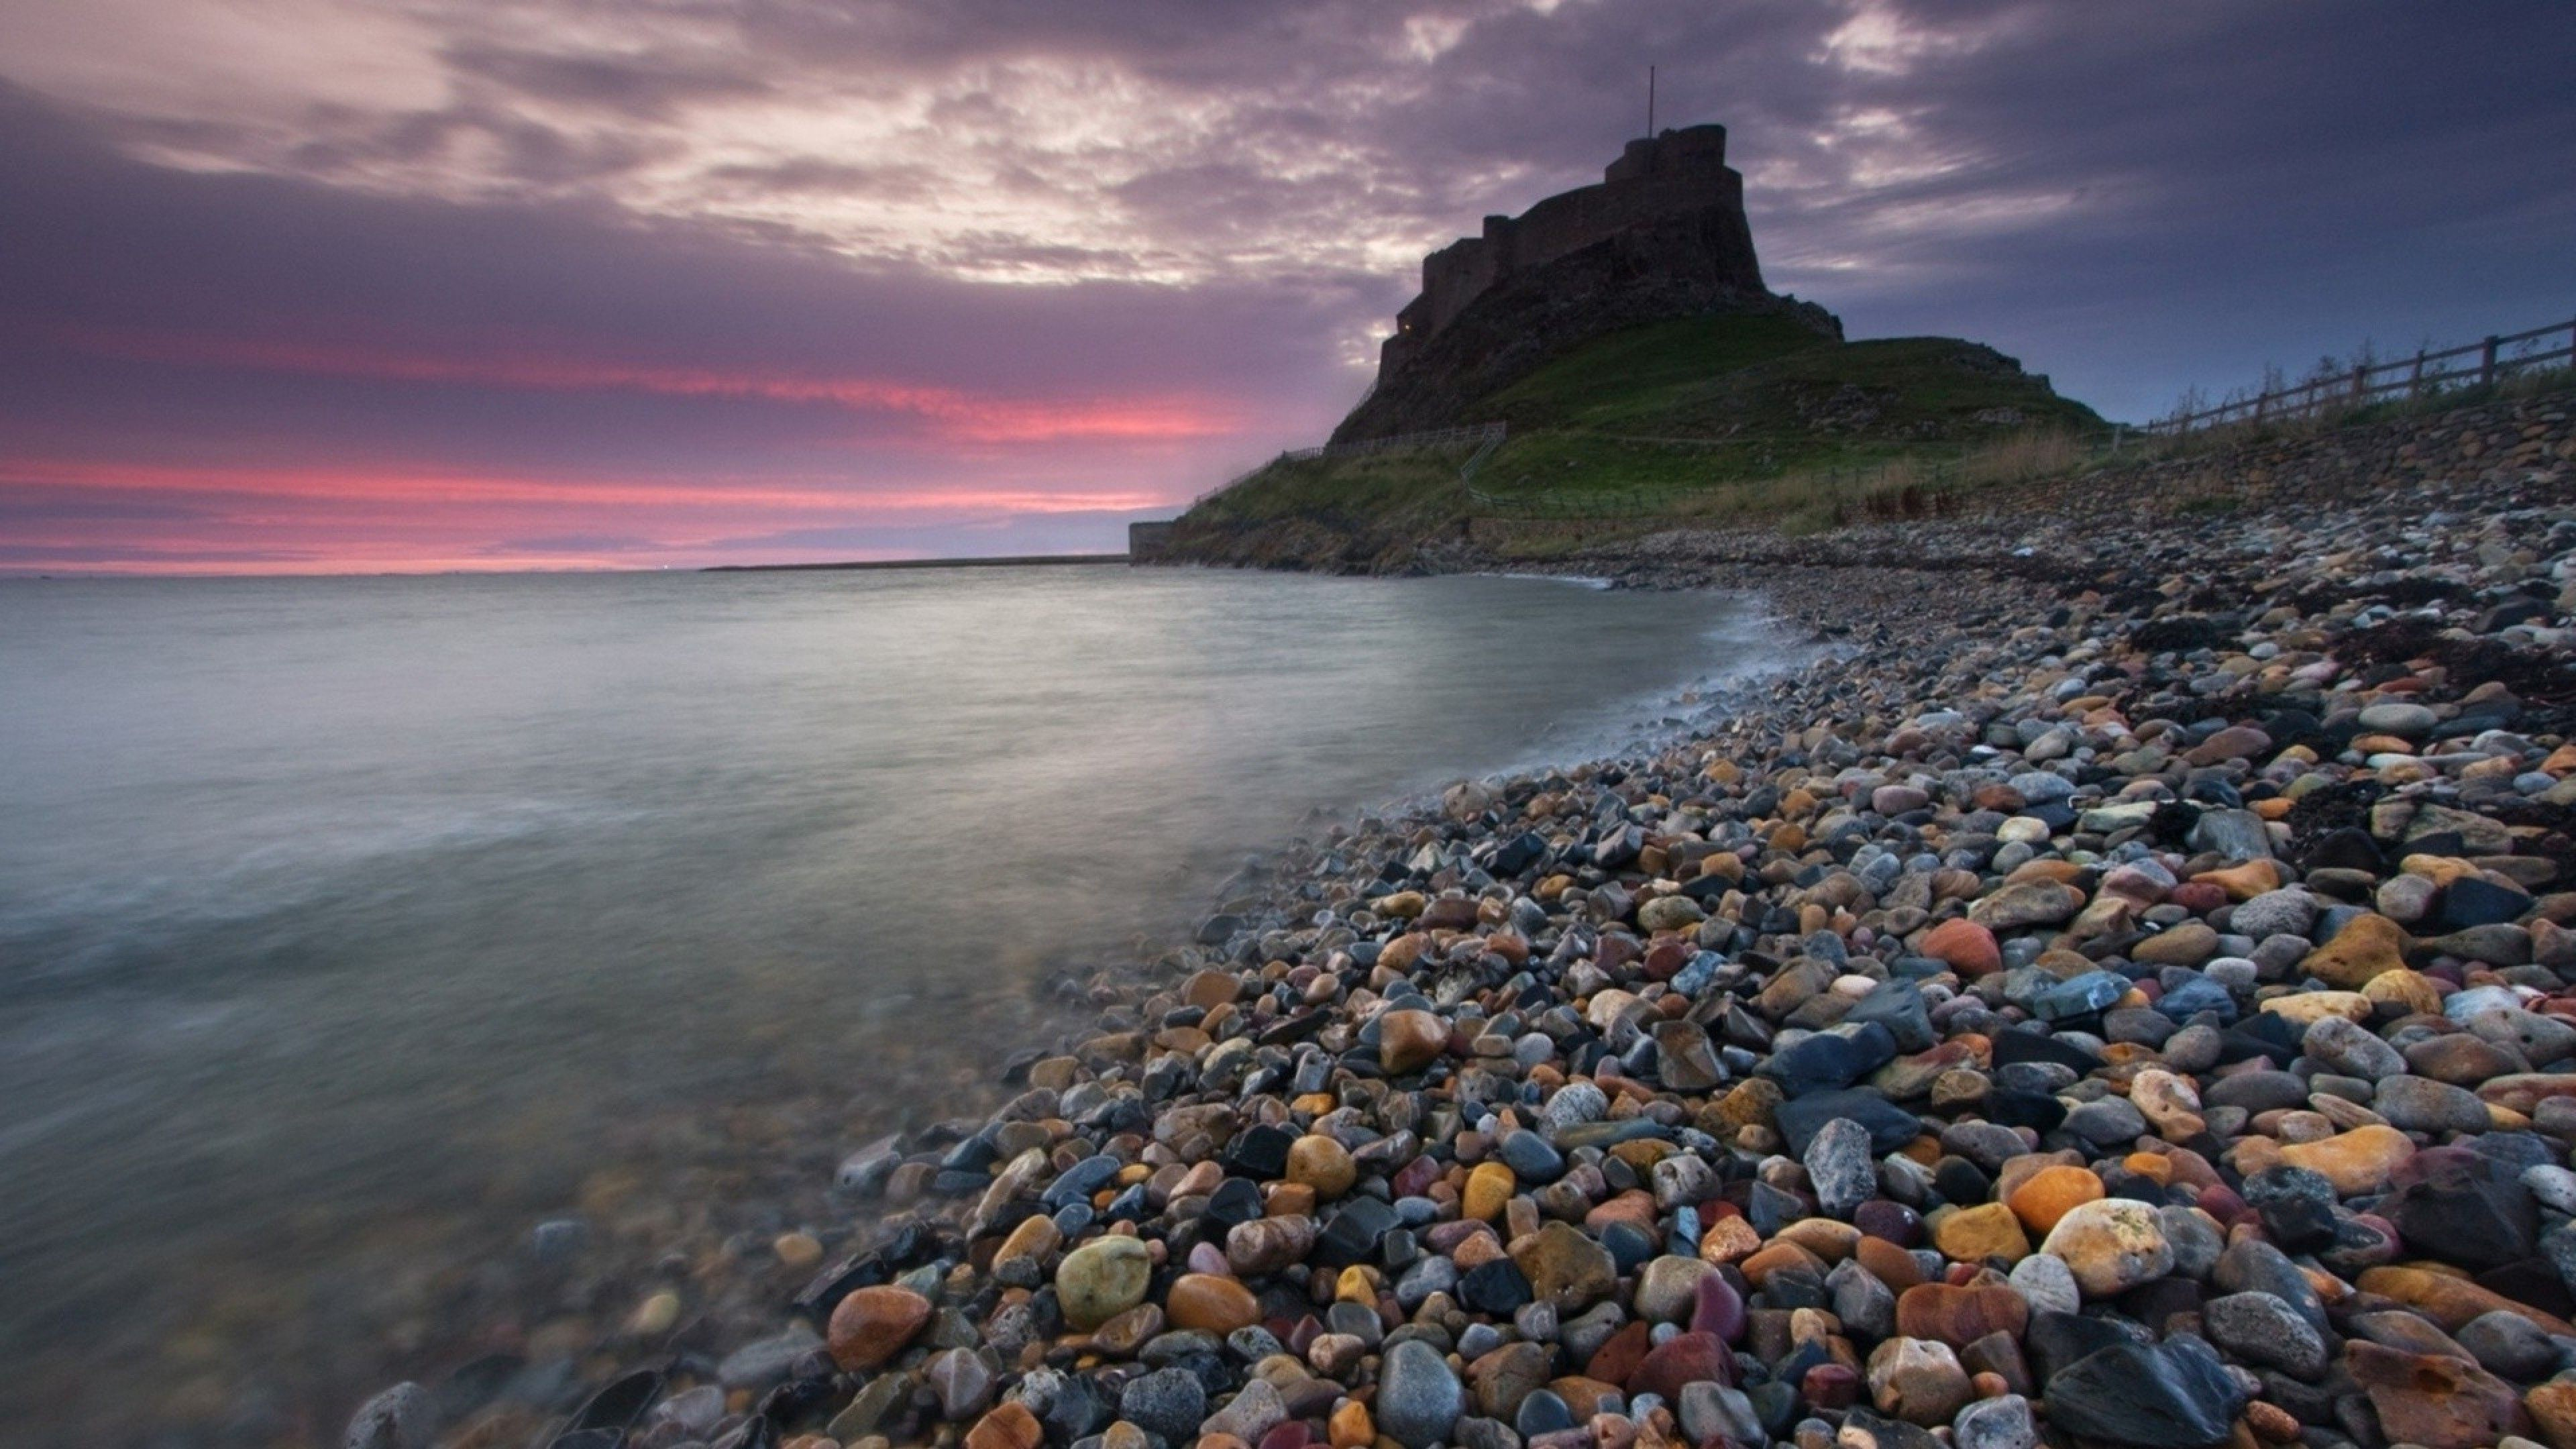 Sea Beach Rocks Stones 4k Hd Wallpapers Beach Rocks Beautiful Sunset Nature Pic